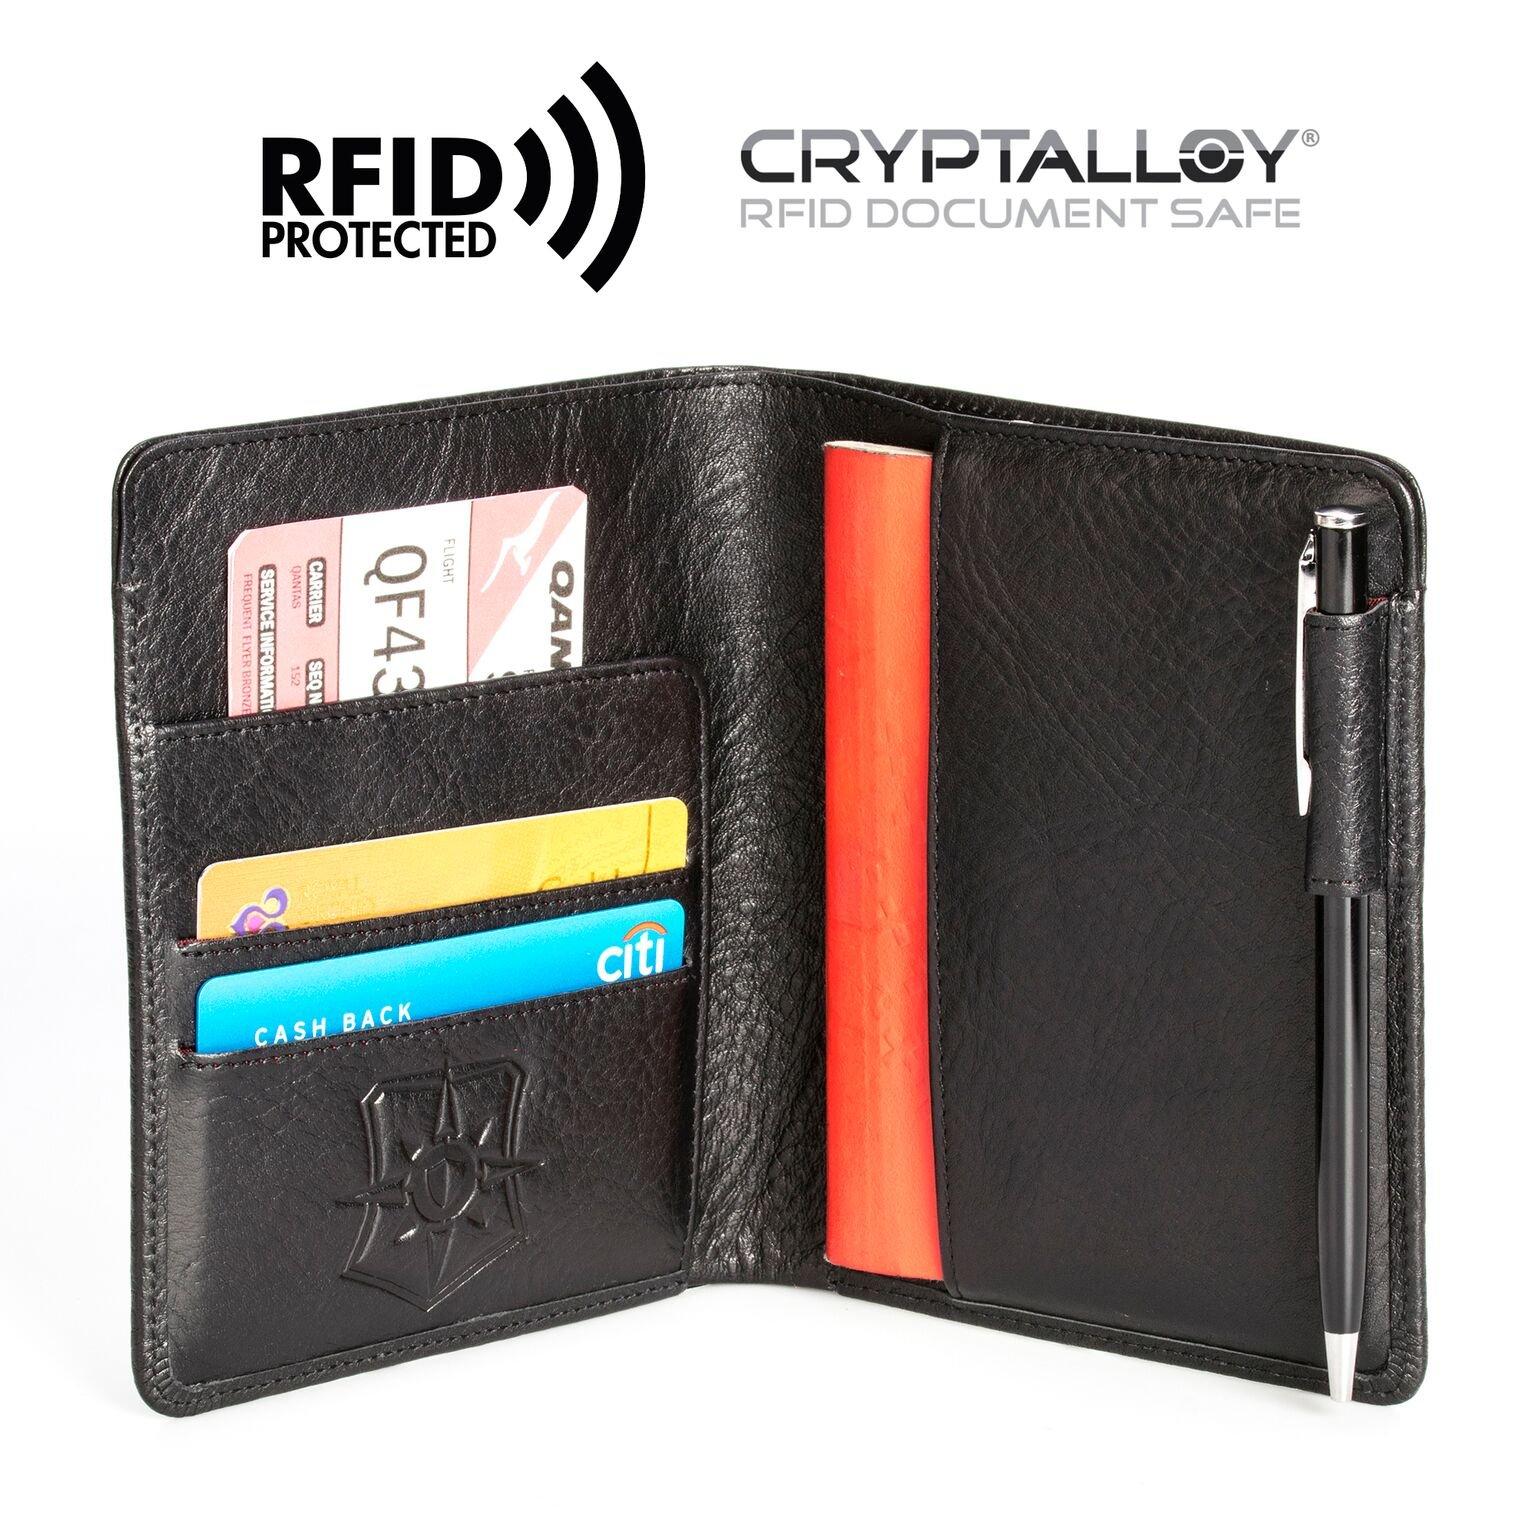 Pagalli Vincente Men Women Unisex Premium Genuine Leather RFID Blocking Pen Boarding Pass Credit Card ID Theft Protector Thin Slim Passport Travel Holder Wallet Wallets, Black